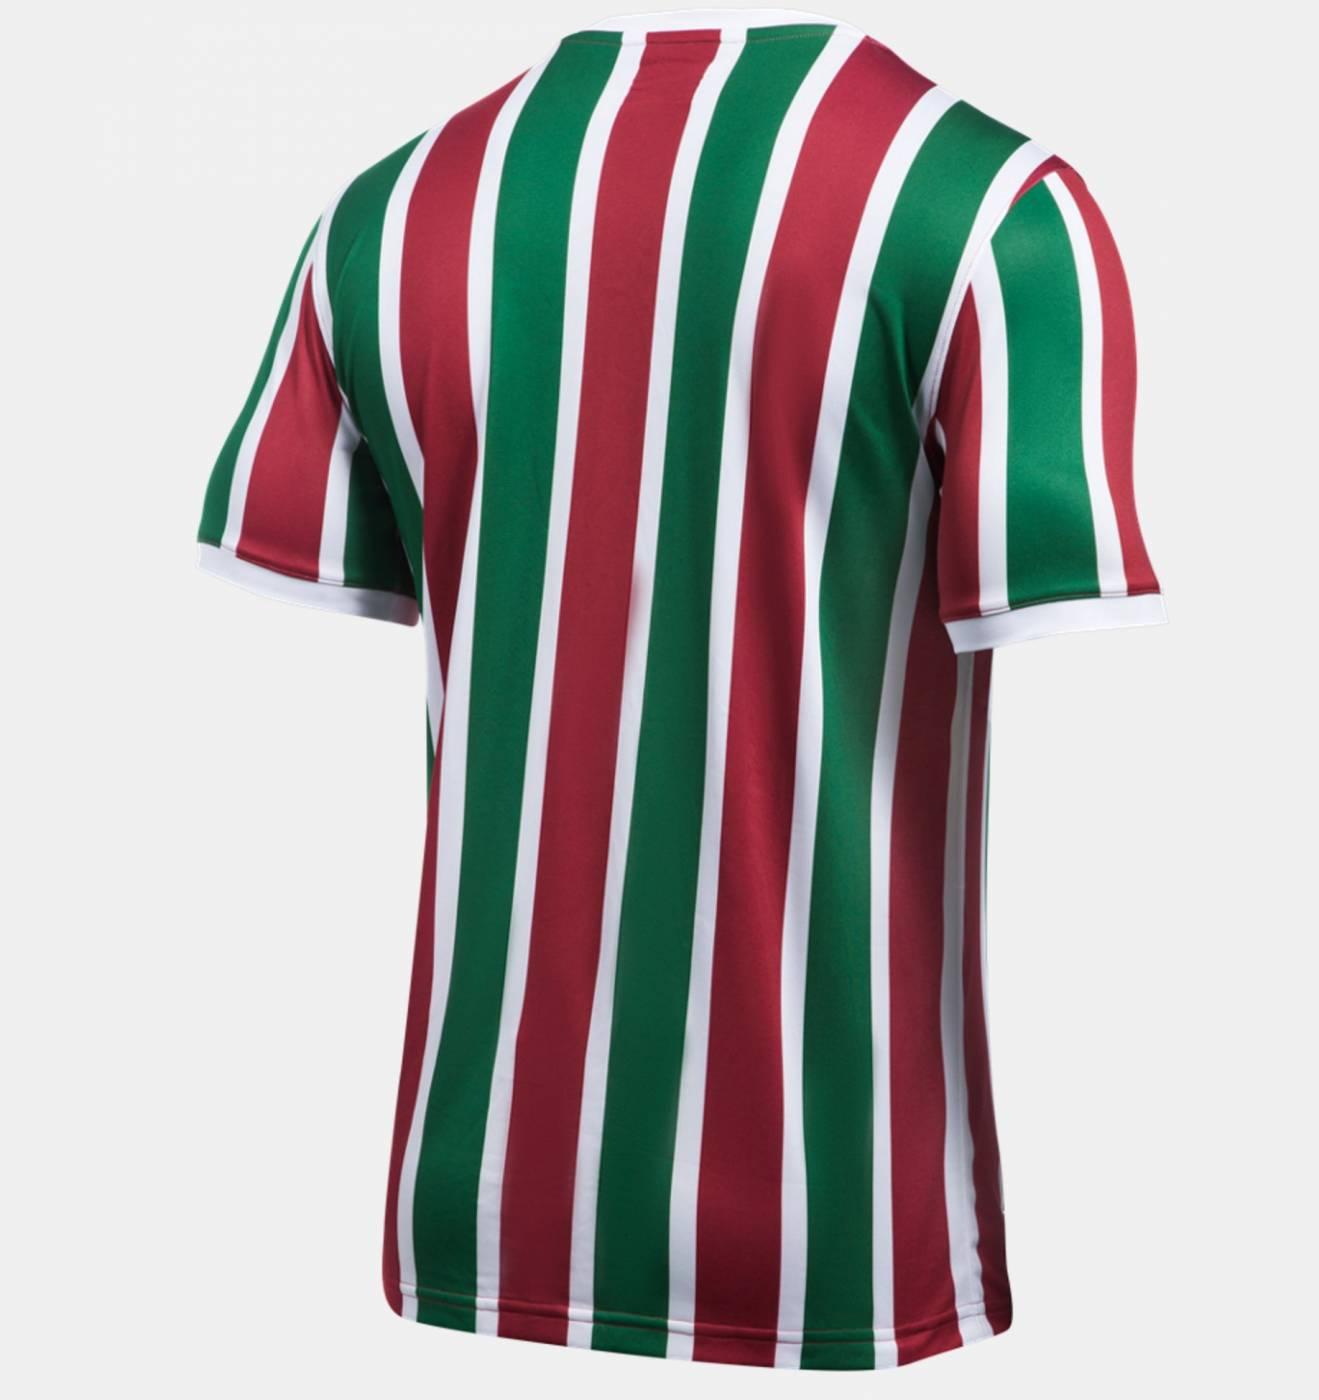 Camisa Fluminense 1 Under Armour 2017